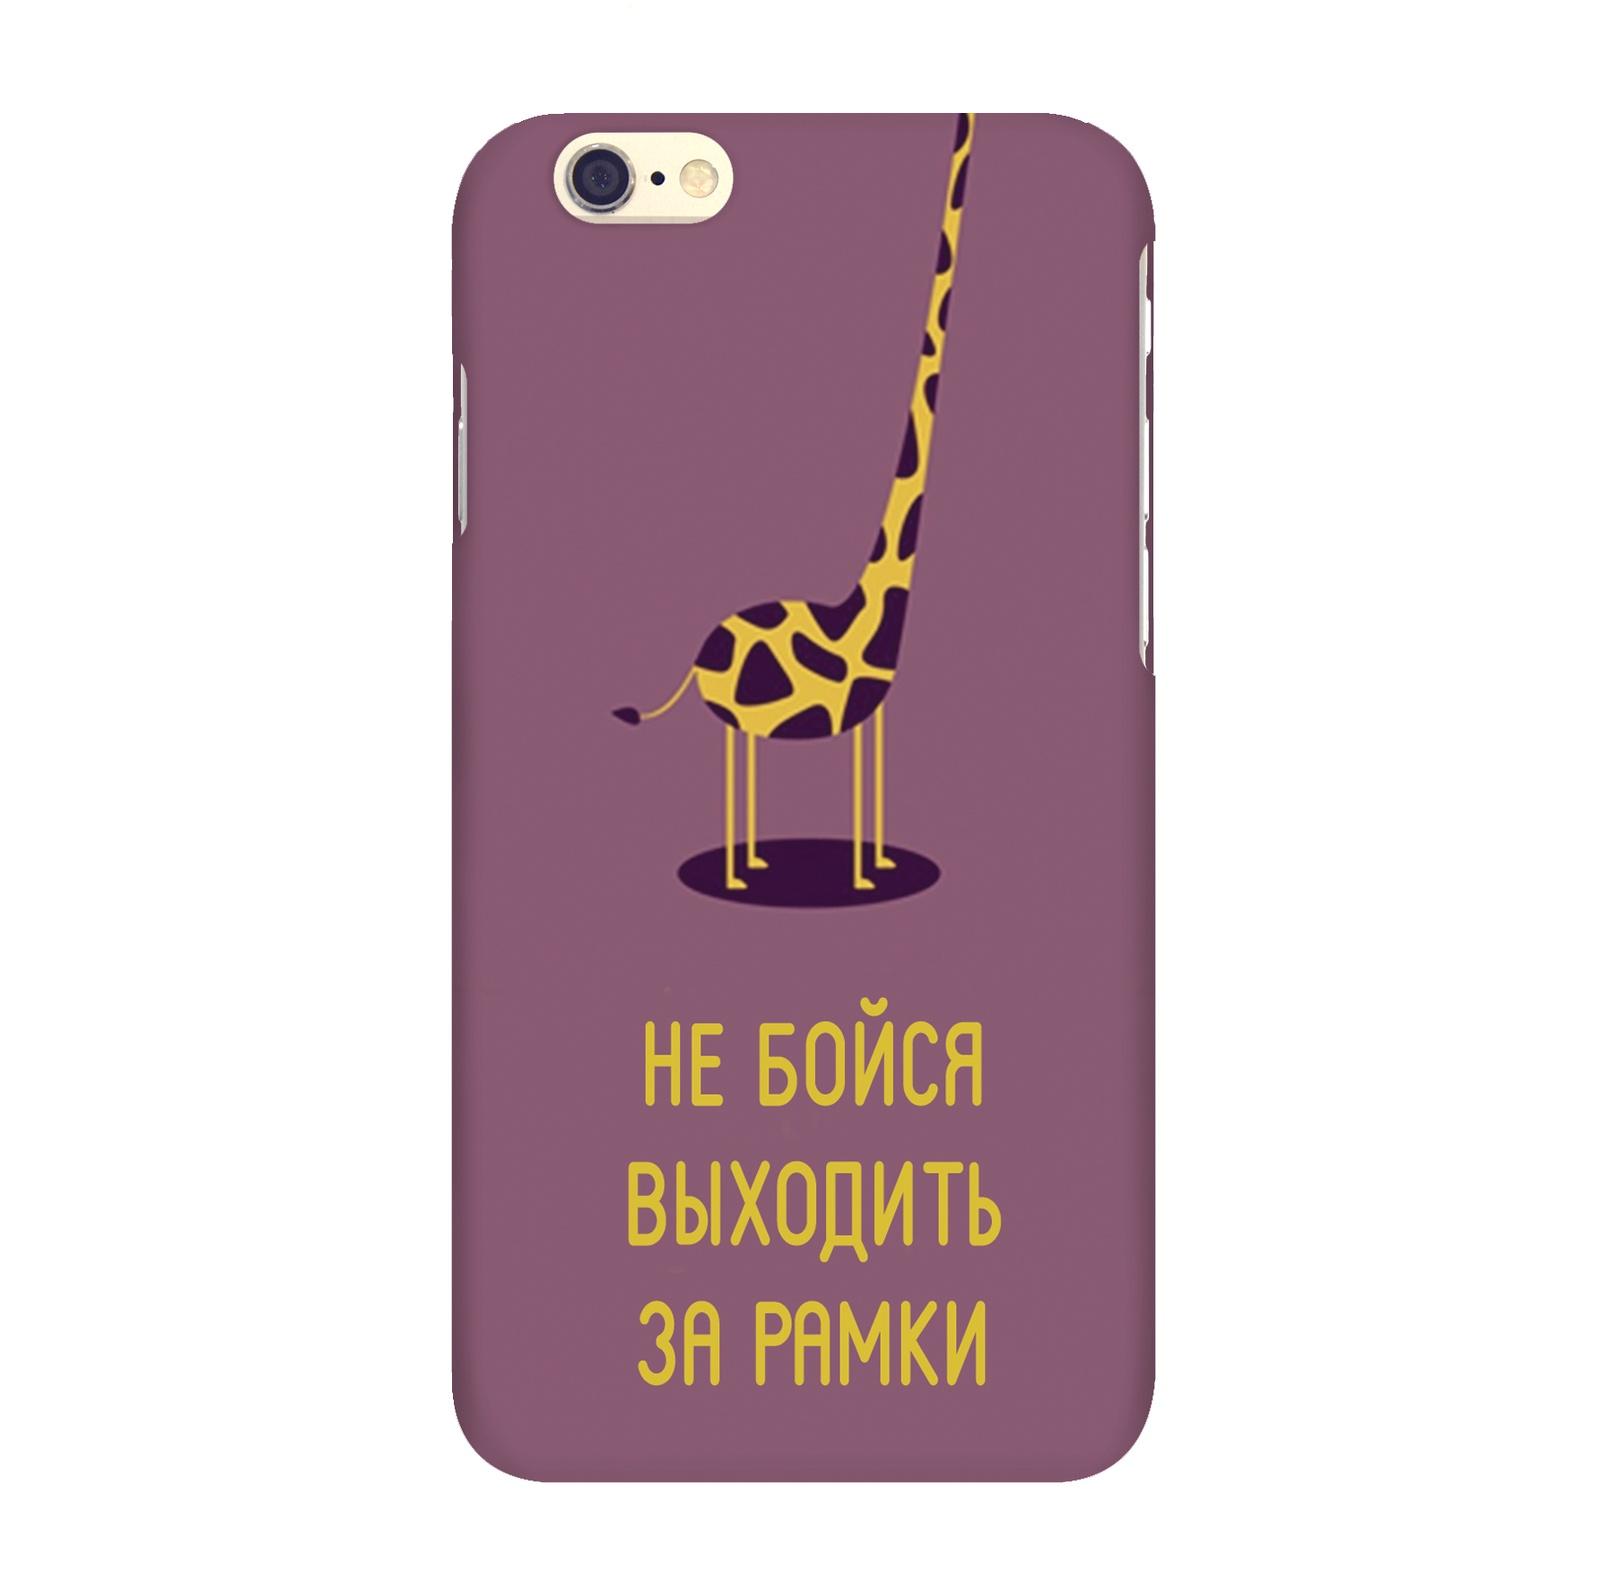 Чехол для сотового телефона Mitya Veselkov IP6.MITYA, IP6.MITYA-260 цена и фото